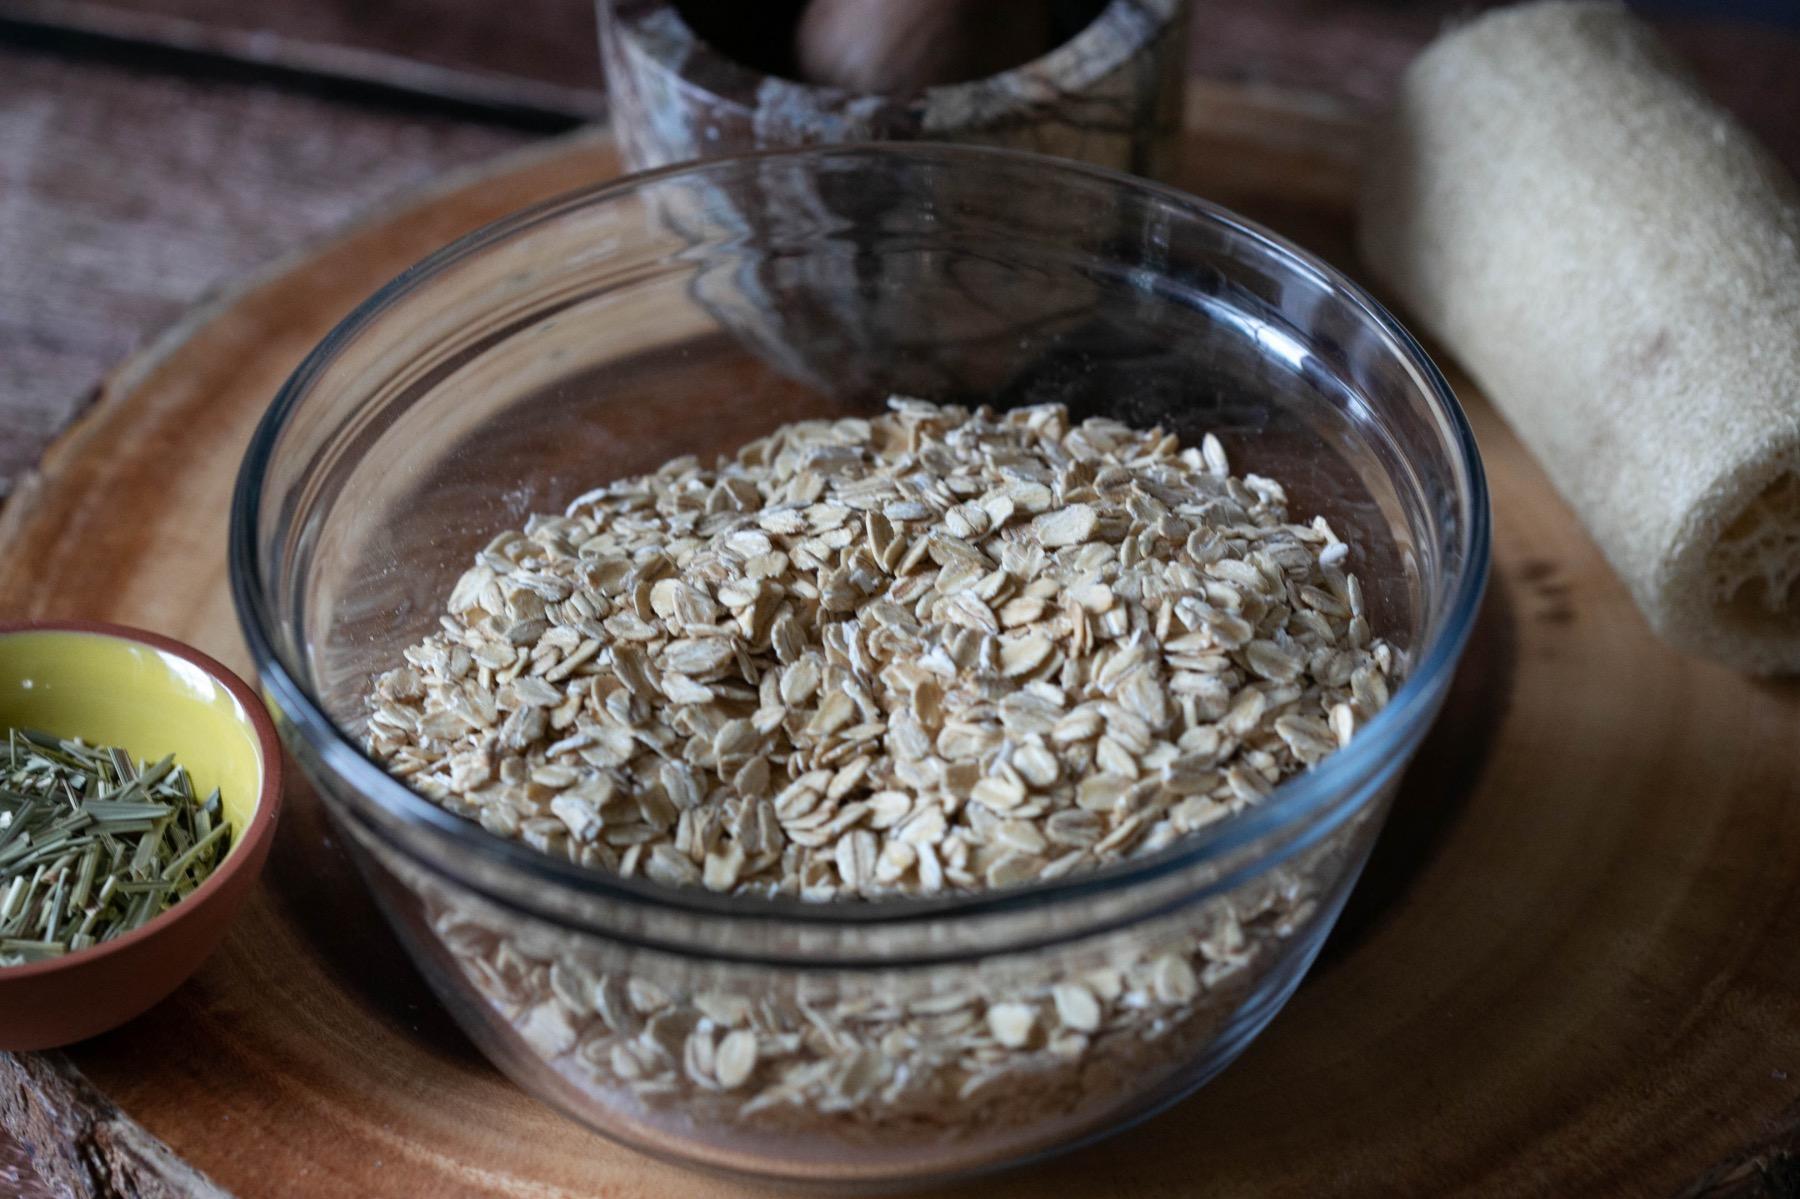 mix together oats and epsom salt bath soak recipe